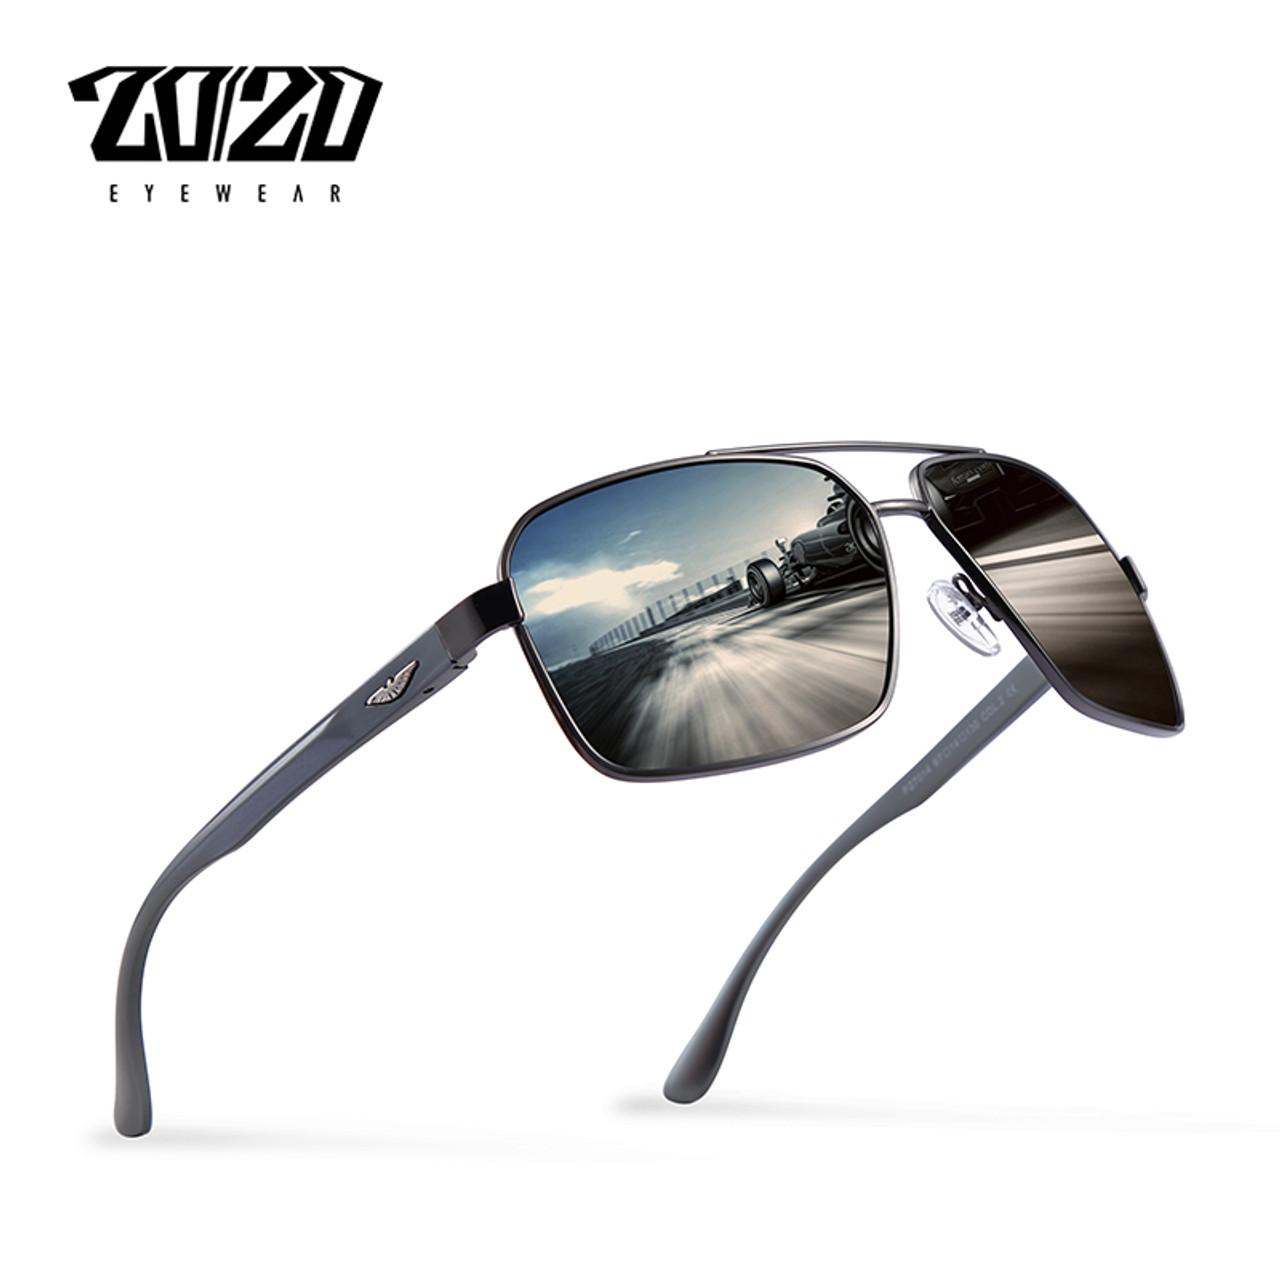 c0b9218444 20 20 Brand Design New Aluminum Polarized Sunglasses Men Travel Driving Sun Glasses  Classic Male Eyewear Gafas PZ7014 - OnshopDeals.Com